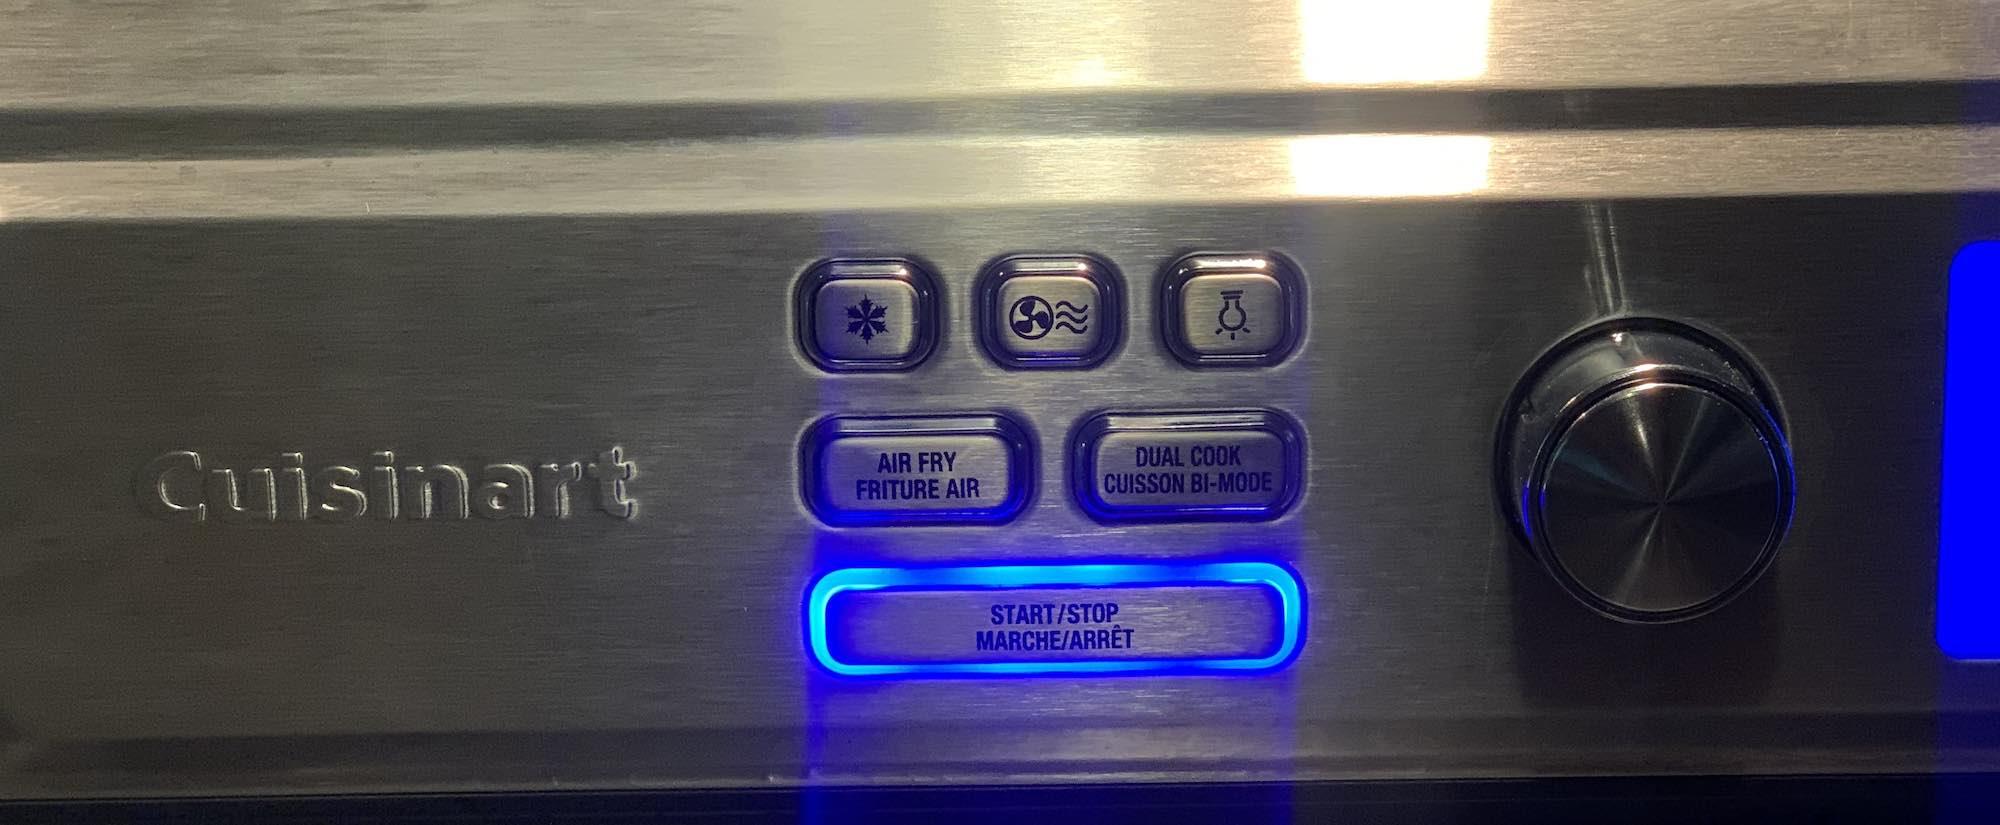 Cusinart Airfryer toaster oven menu